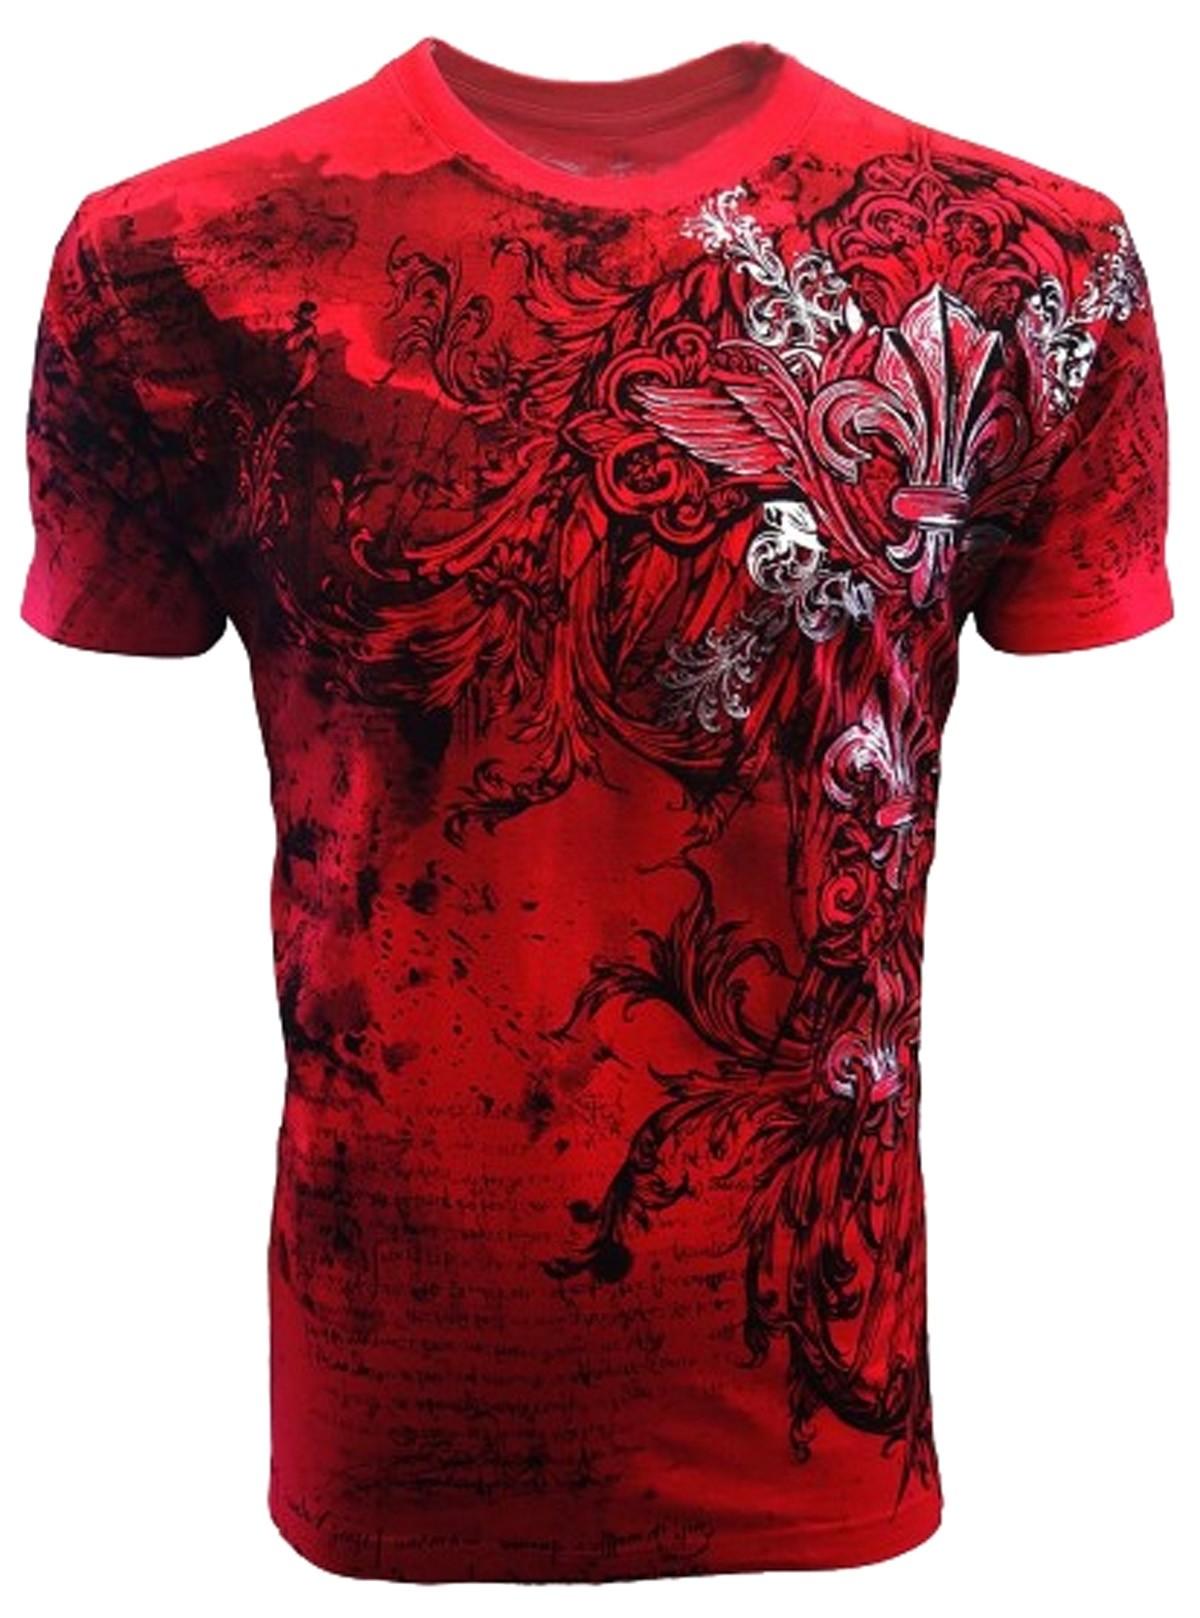 Konflic Clothing - Royal Fleur De Lis T-Shirt